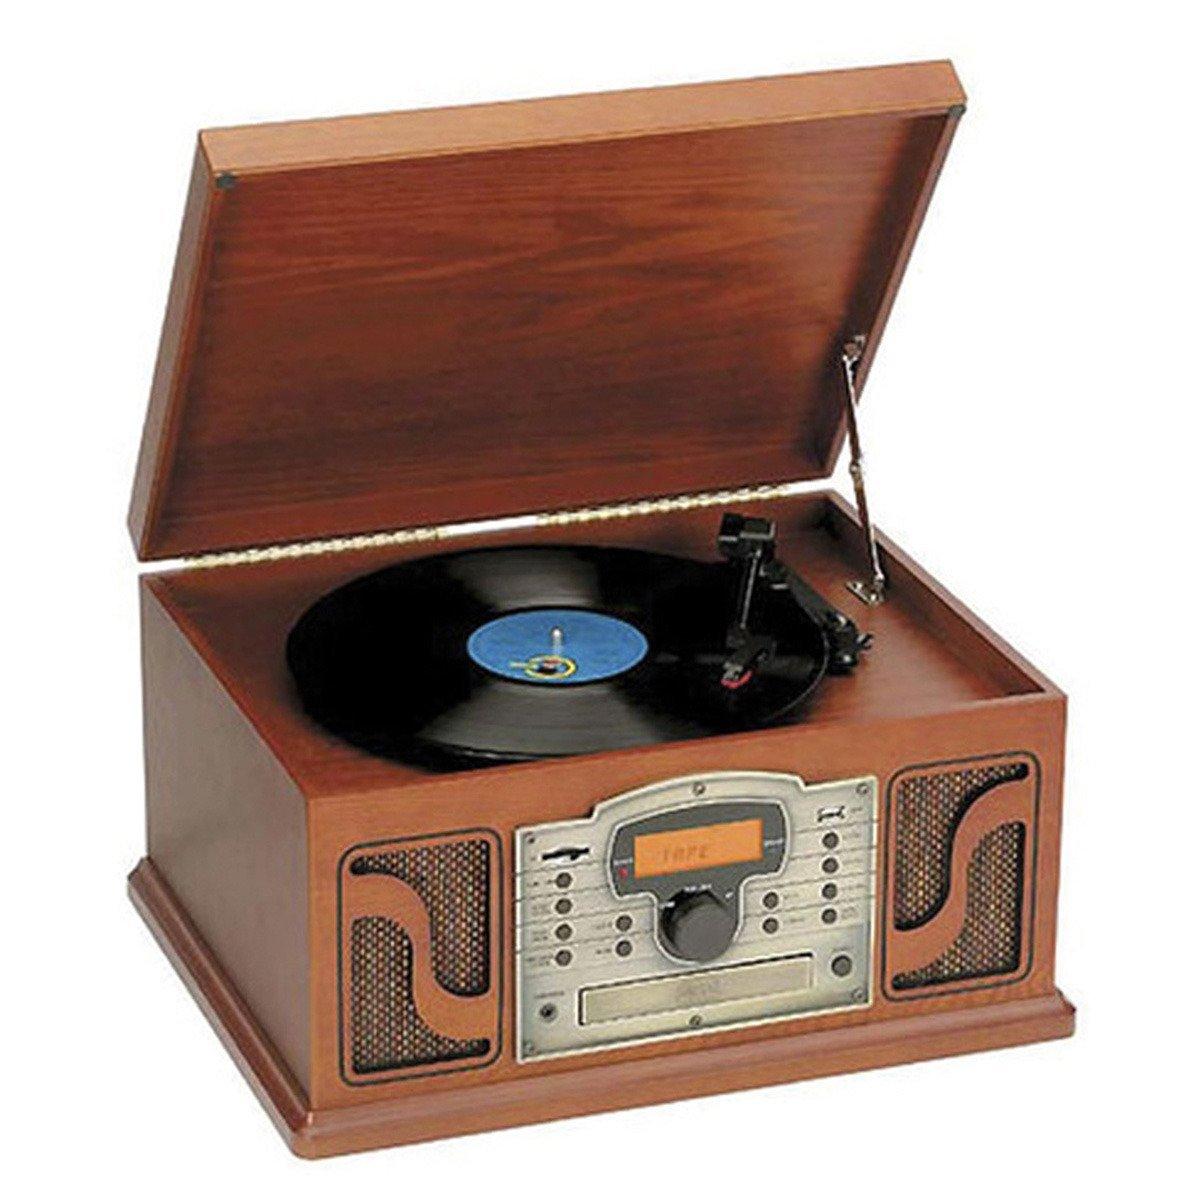 Radiocassette Lauson CL123 CD  MP3 con tocadiscos y USB